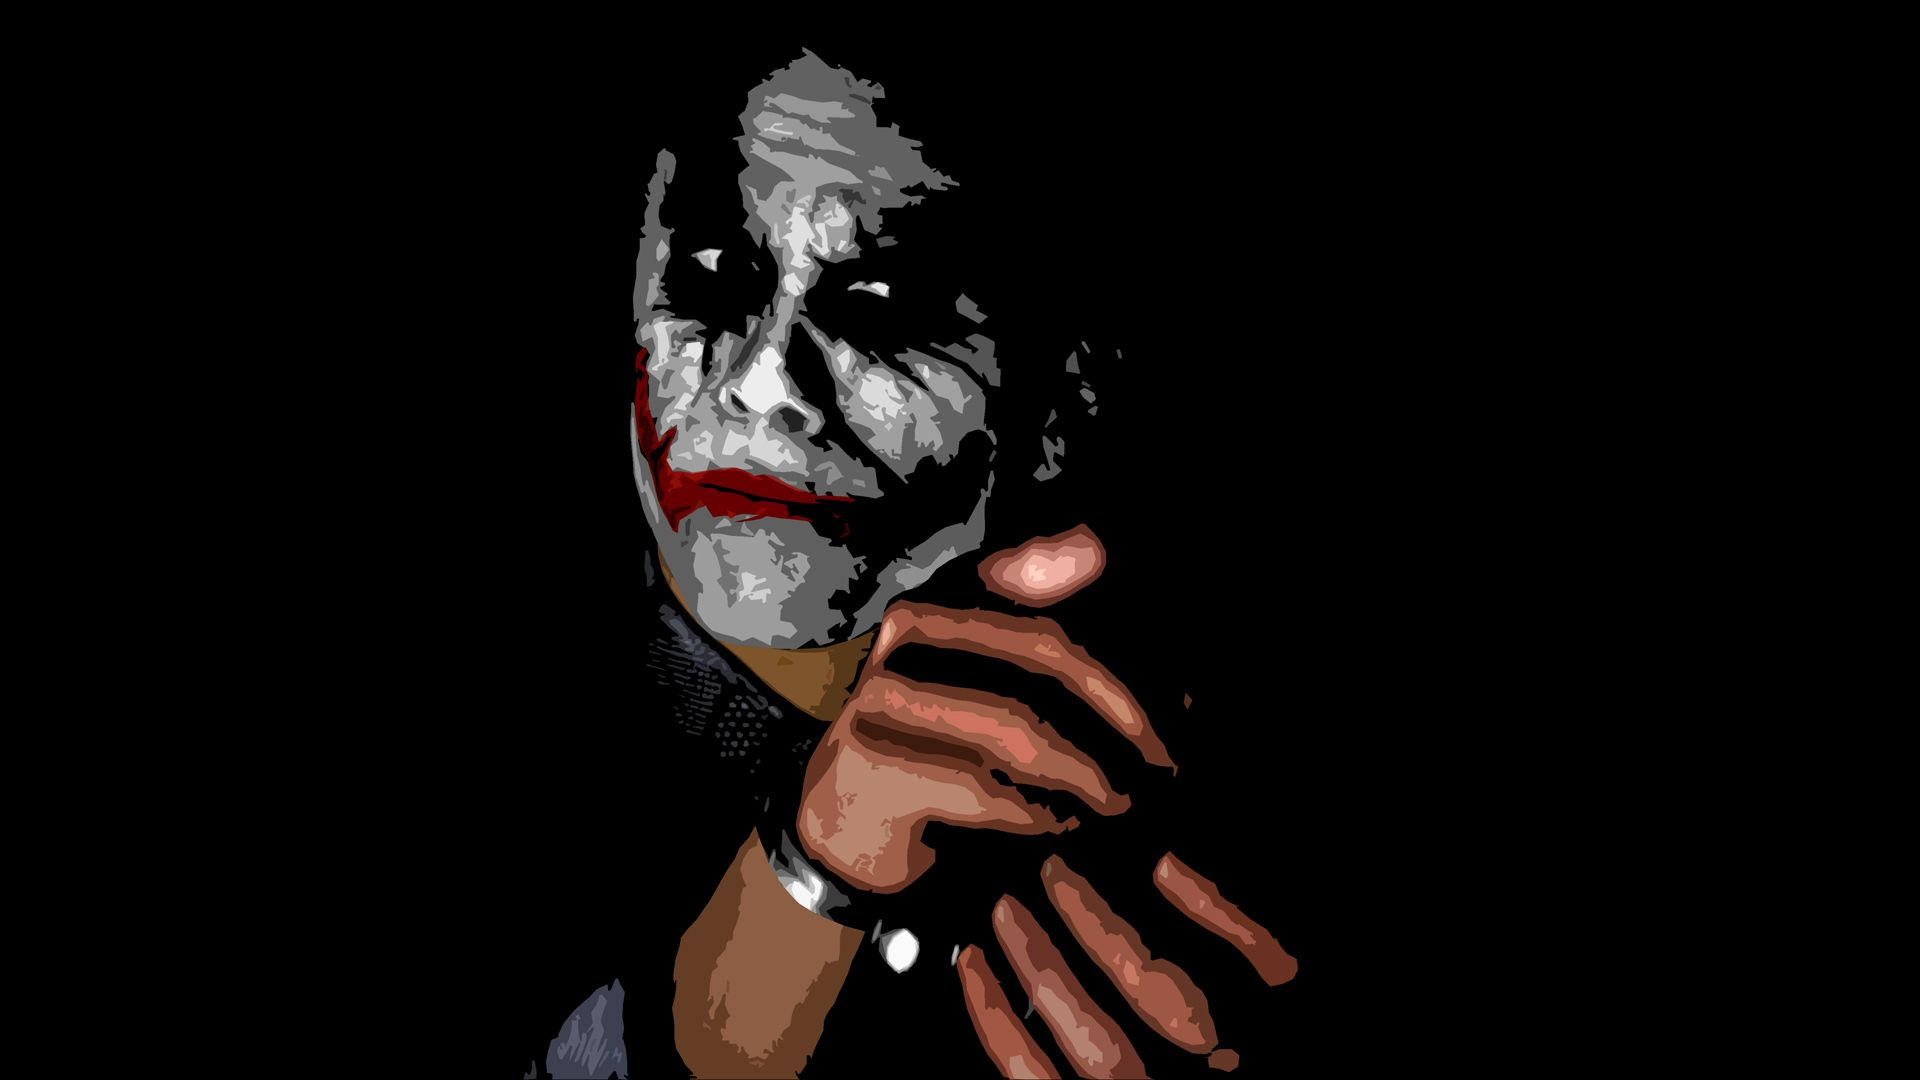 Joker Wallpaper Hd Windows 10 Wallpapersafari Joker Hd Wallpaper Joker Wallpapers Joker Images